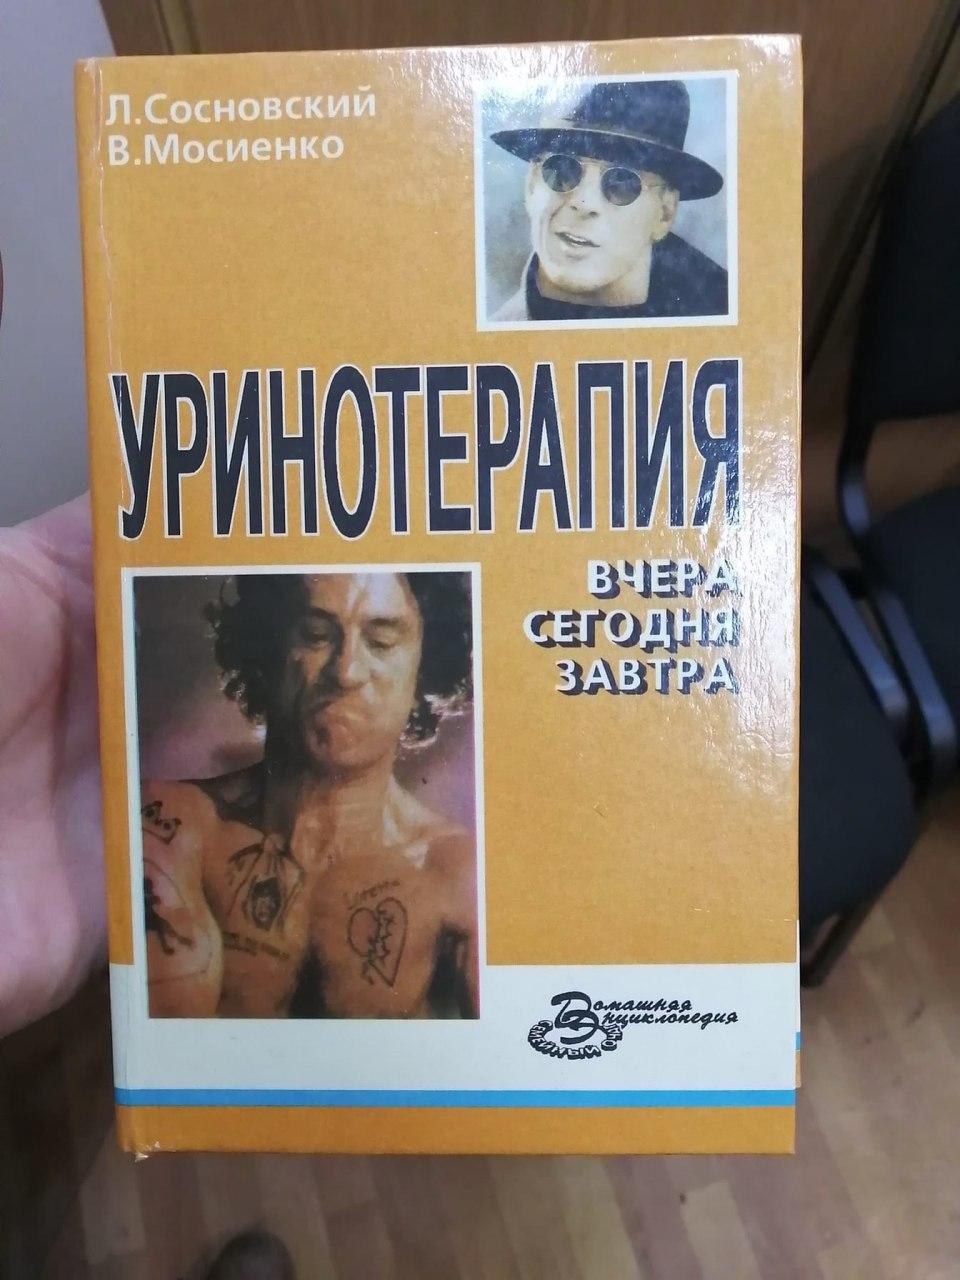 https://ic.pics.livejournal.com/yuripasholok/765139/17672662/17672662_original.jpg